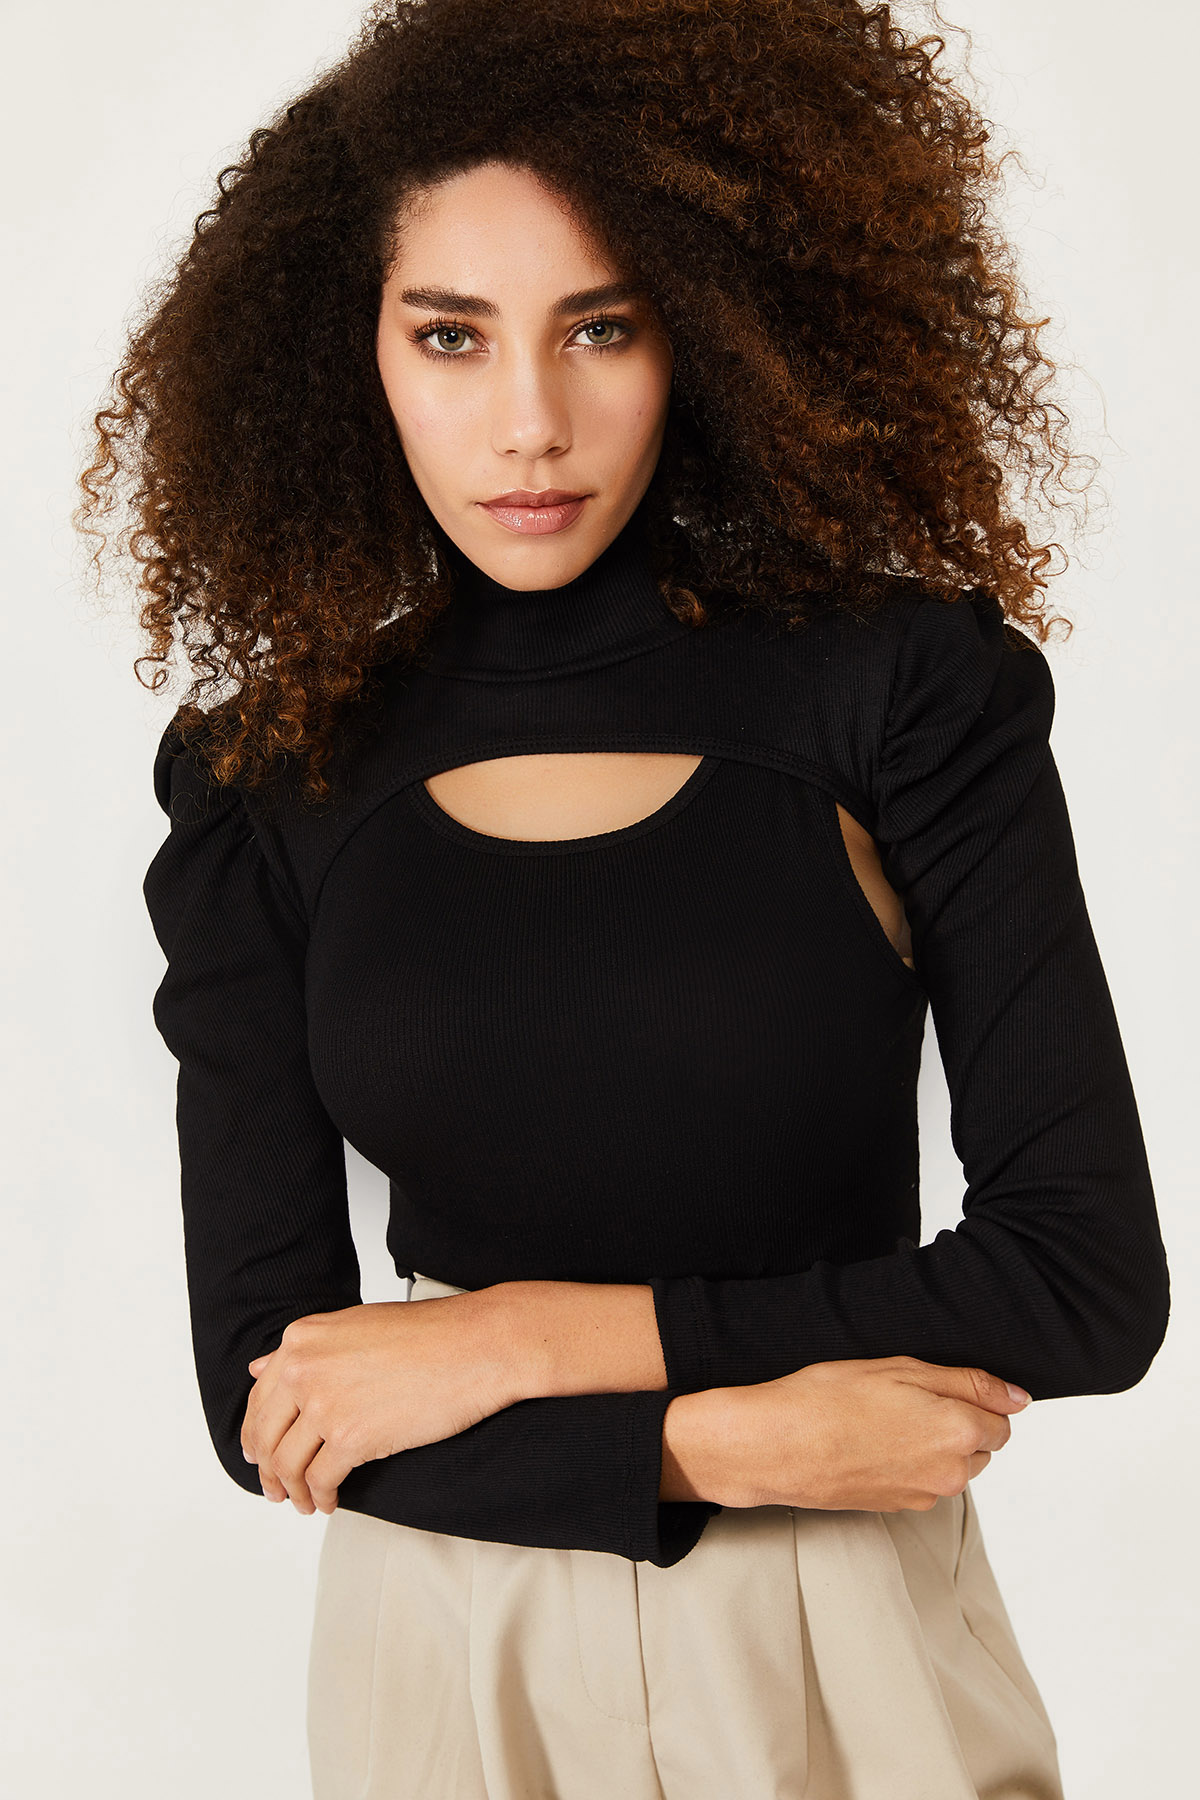 XHAN - Siyah İki Parçalı Prenses Kol Bluz 1KXK2-44552-02